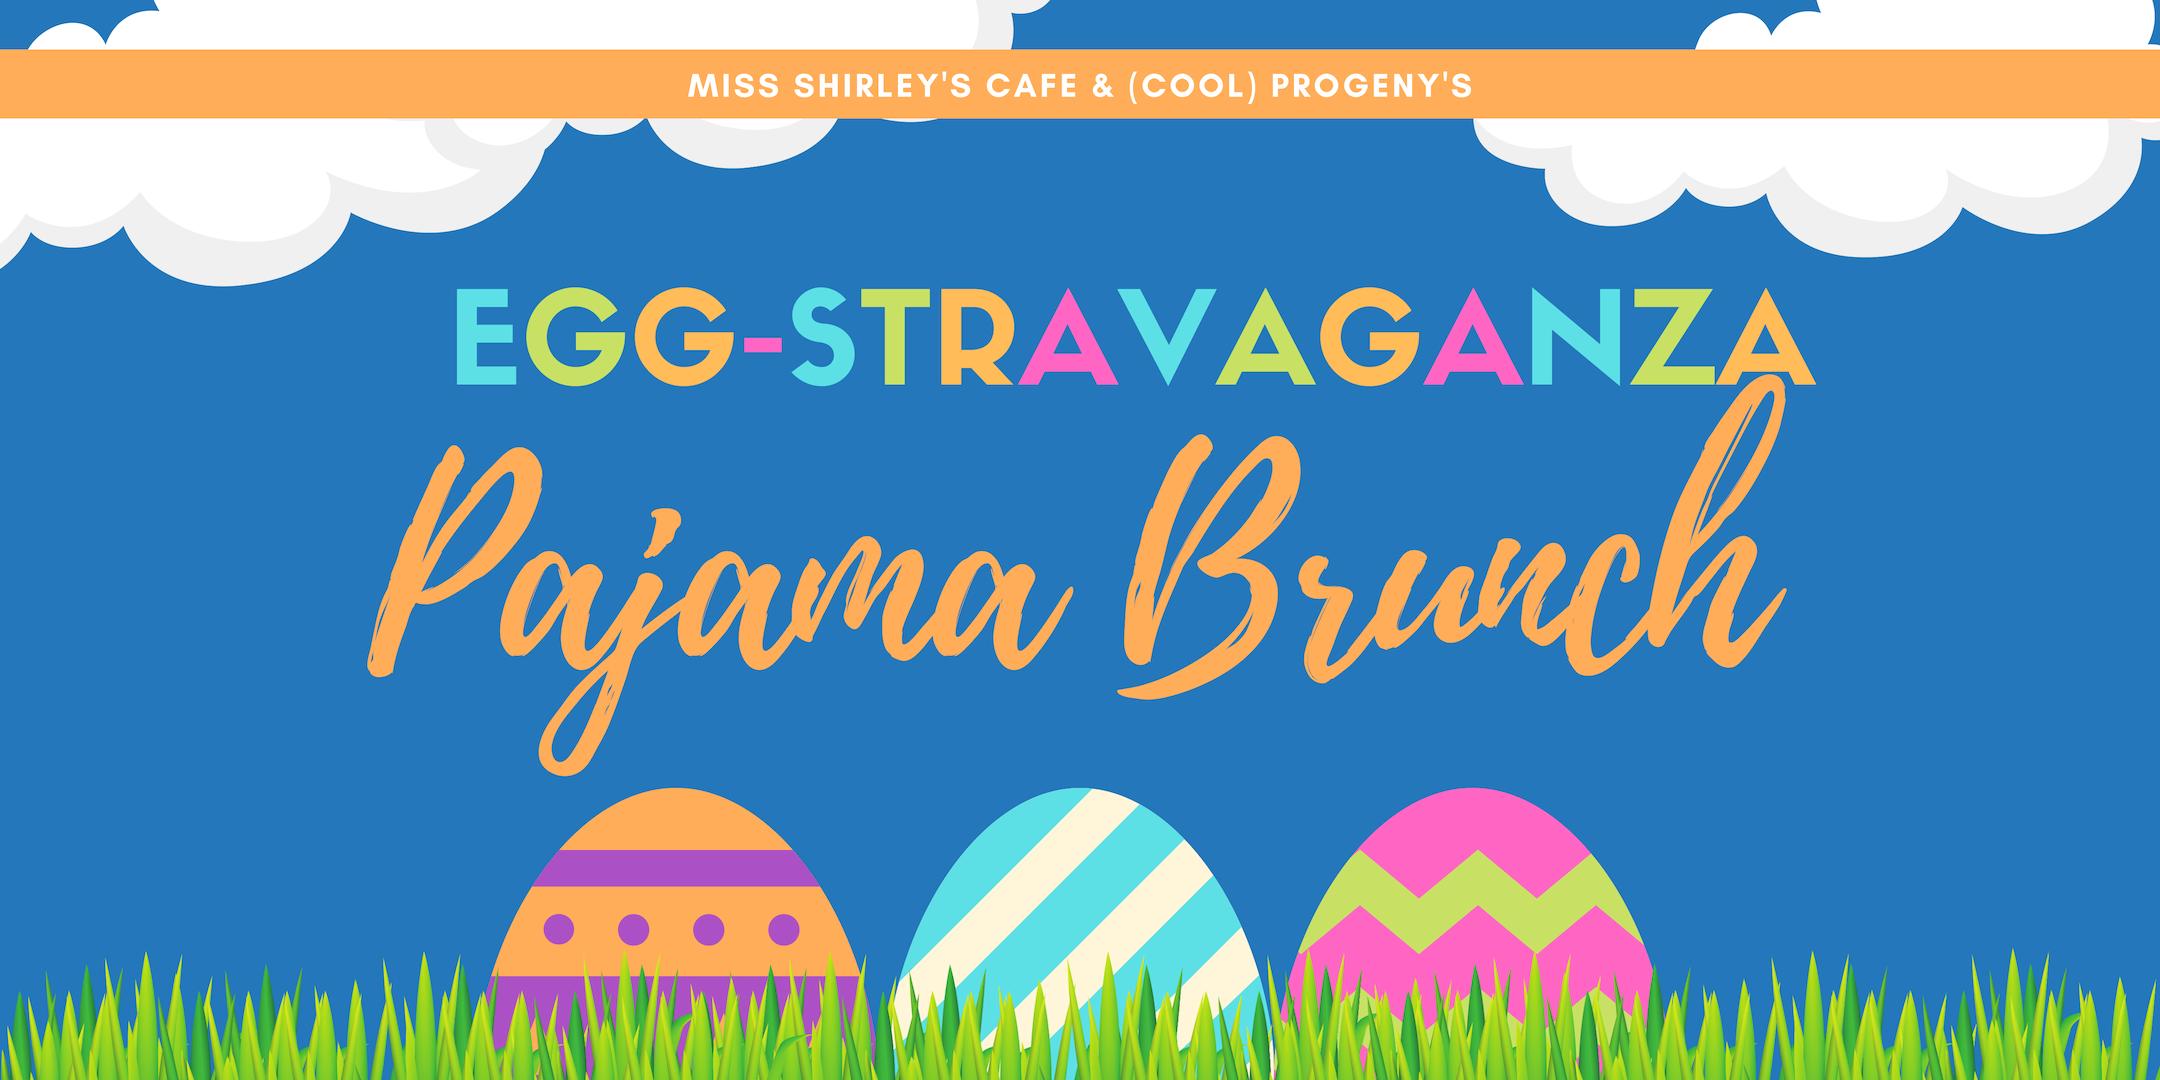 Miss Shirley's Eggstravaganza PJ Brunch - (cool) progeny